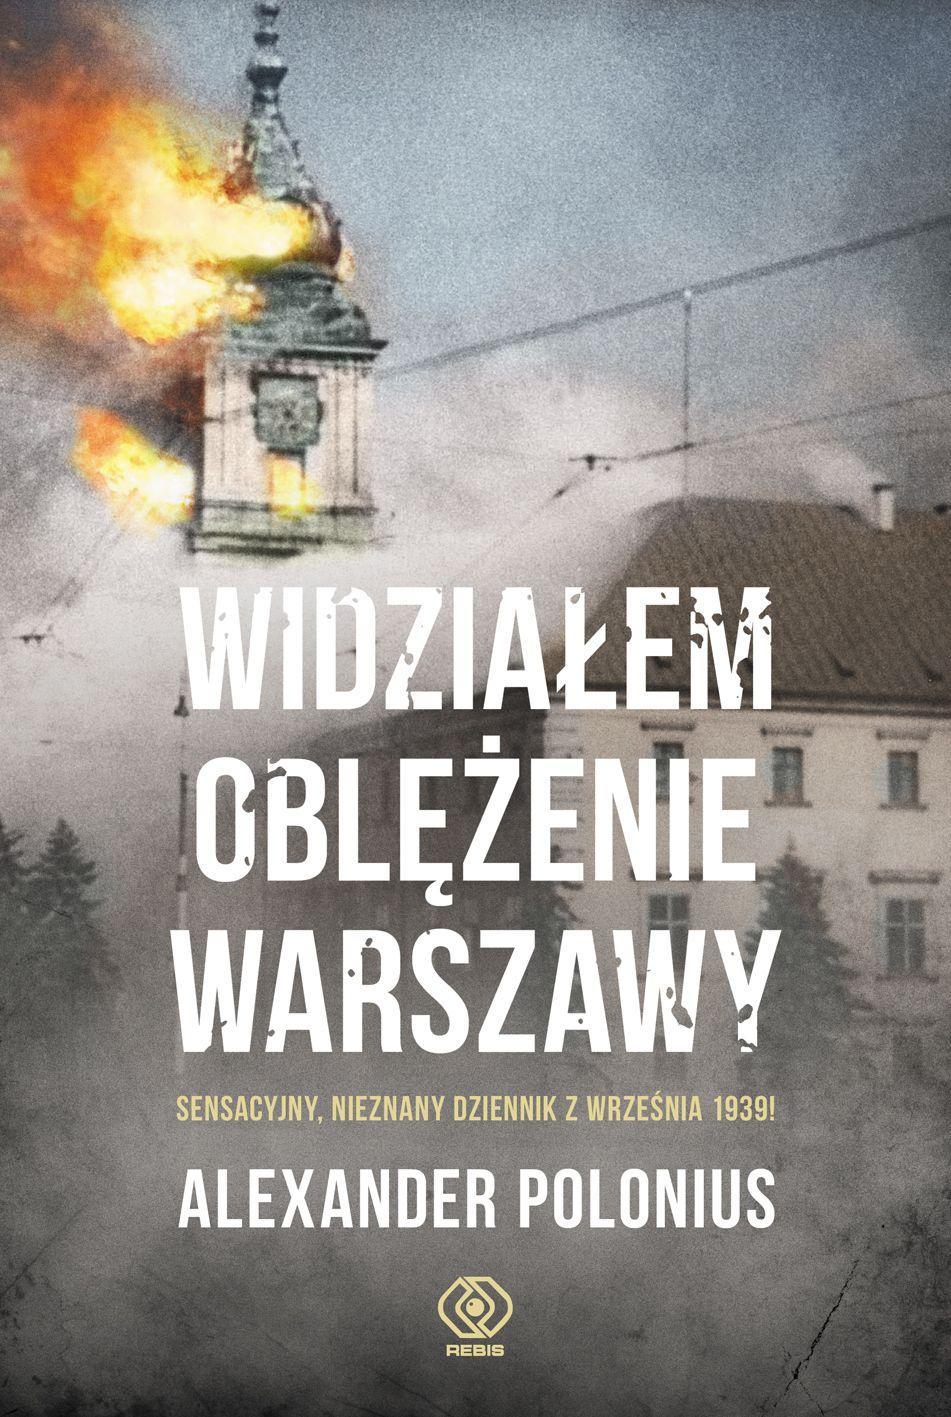 Kup książkę Alexandra Poloniusa z rabatem na empik.com.